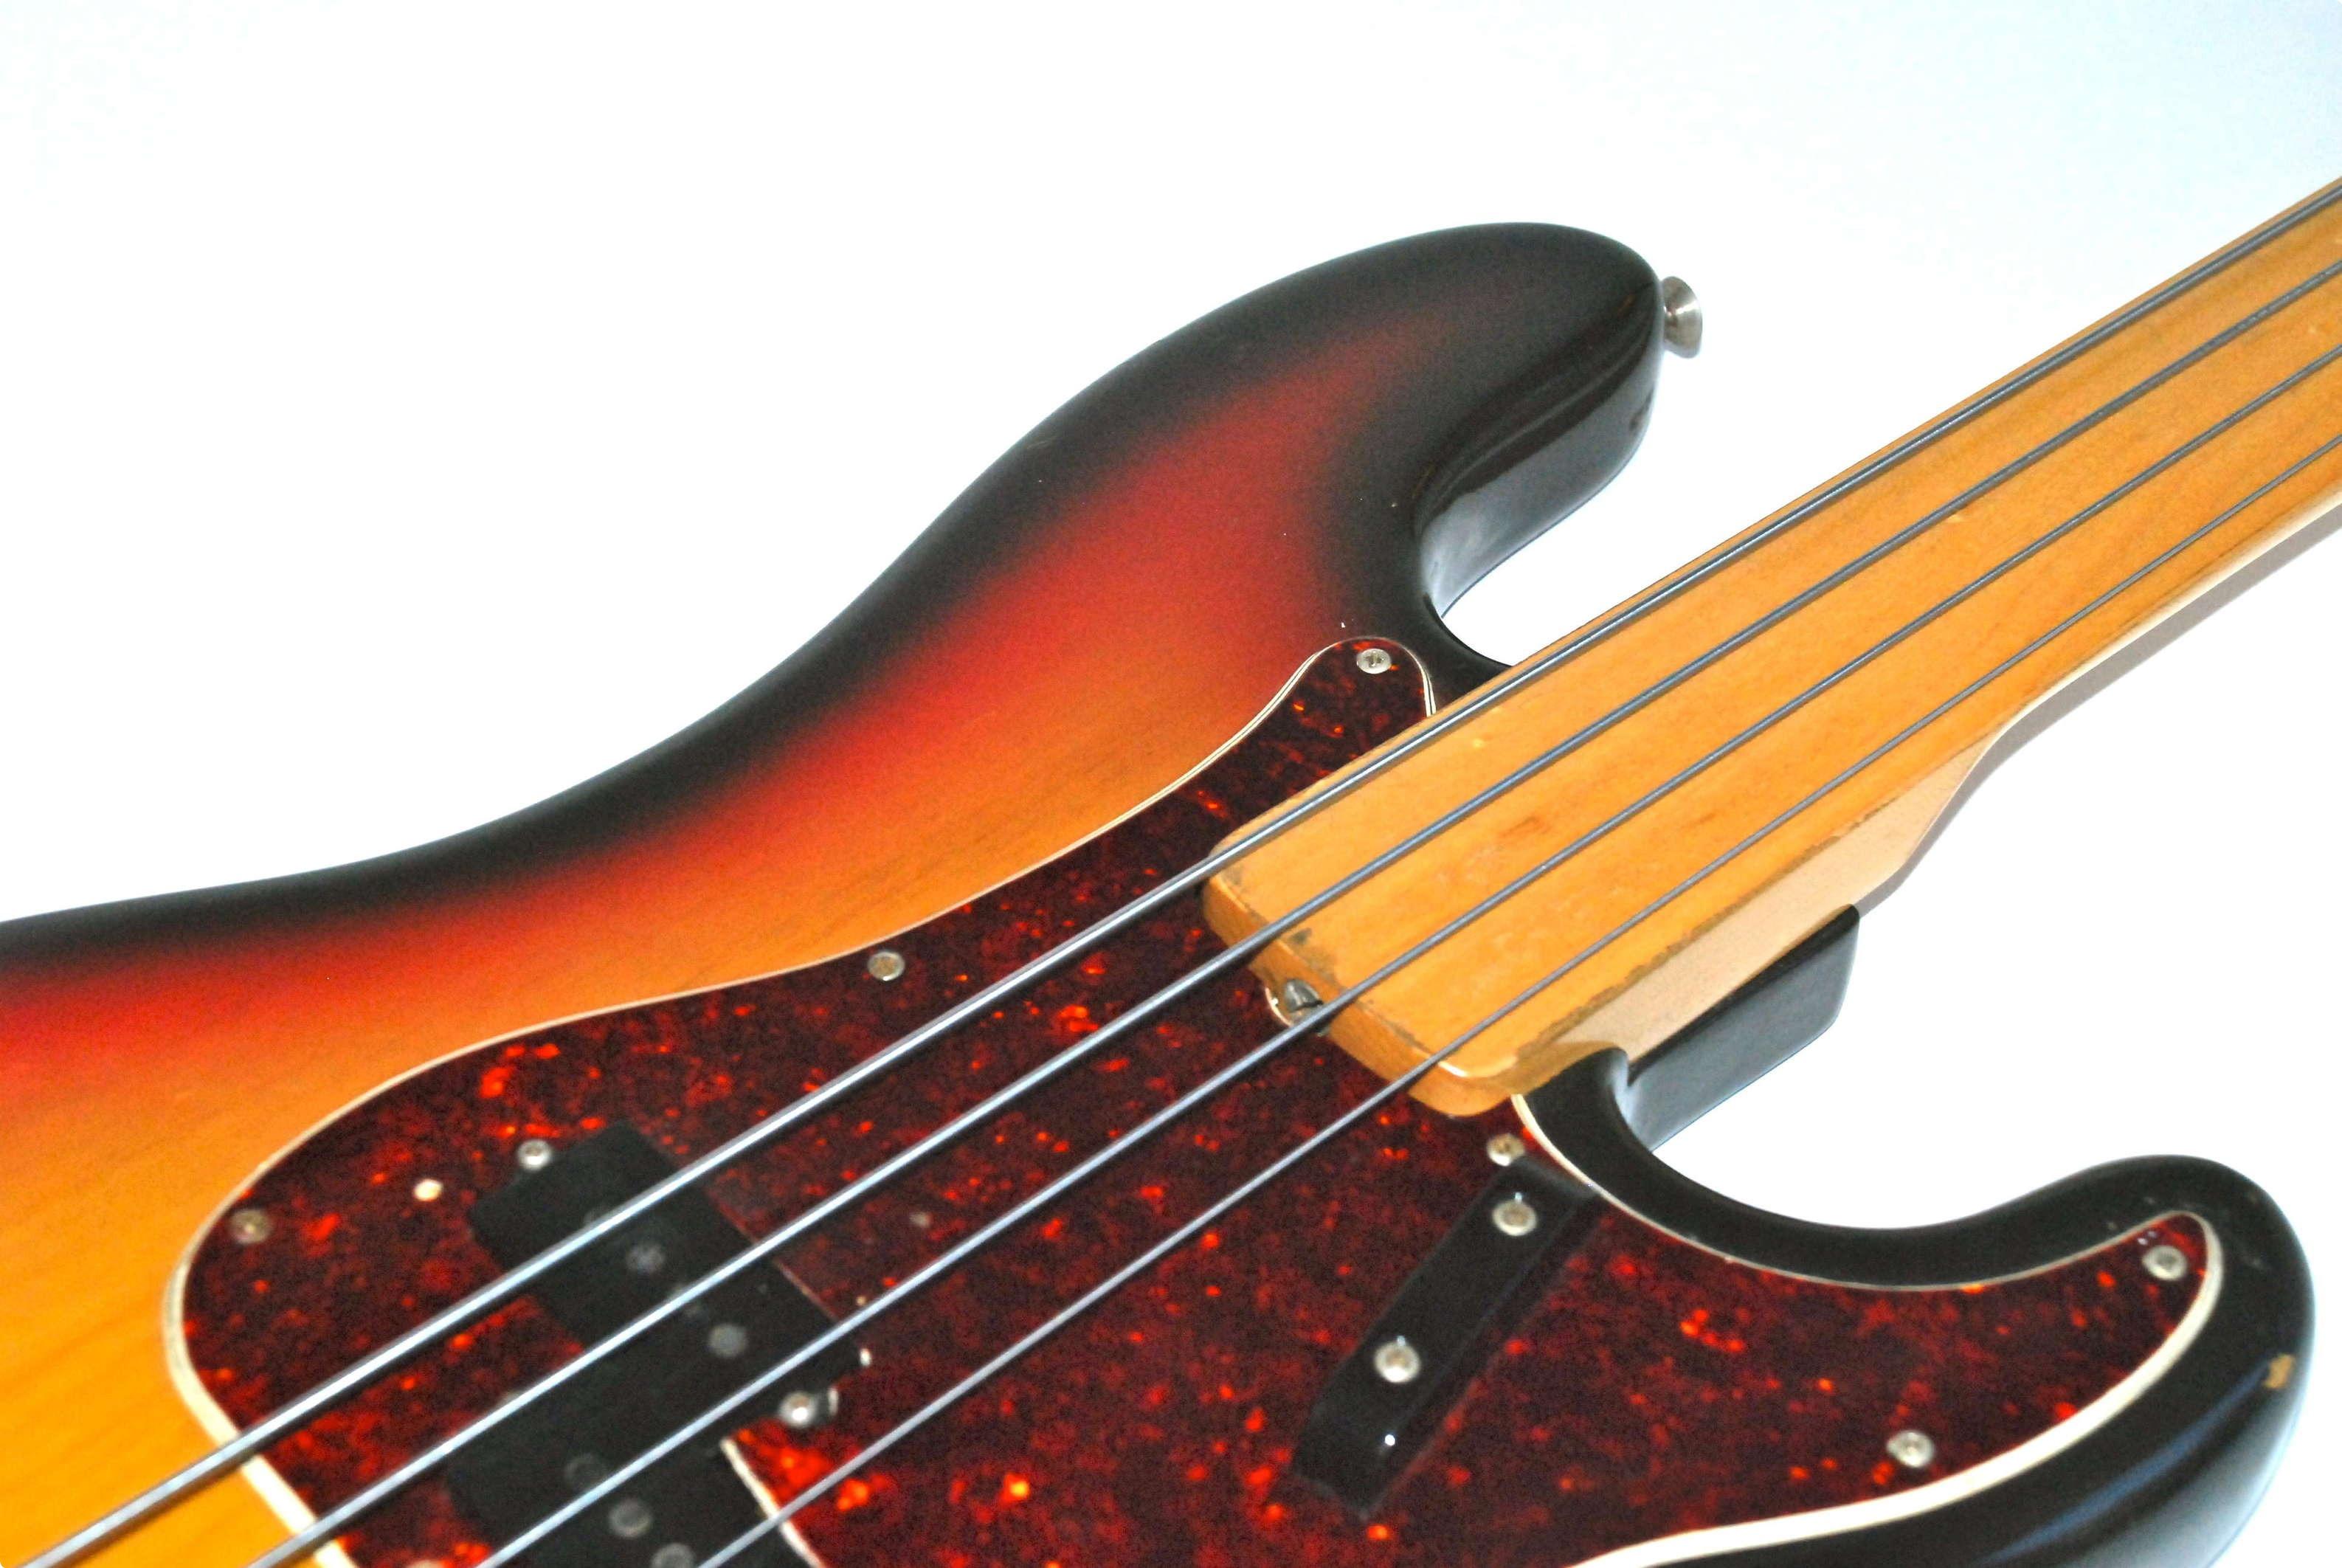 fender precision bass fretless 1971 sunburst bass for sale bass n guitar. Black Bedroom Furniture Sets. Home Design Ideas